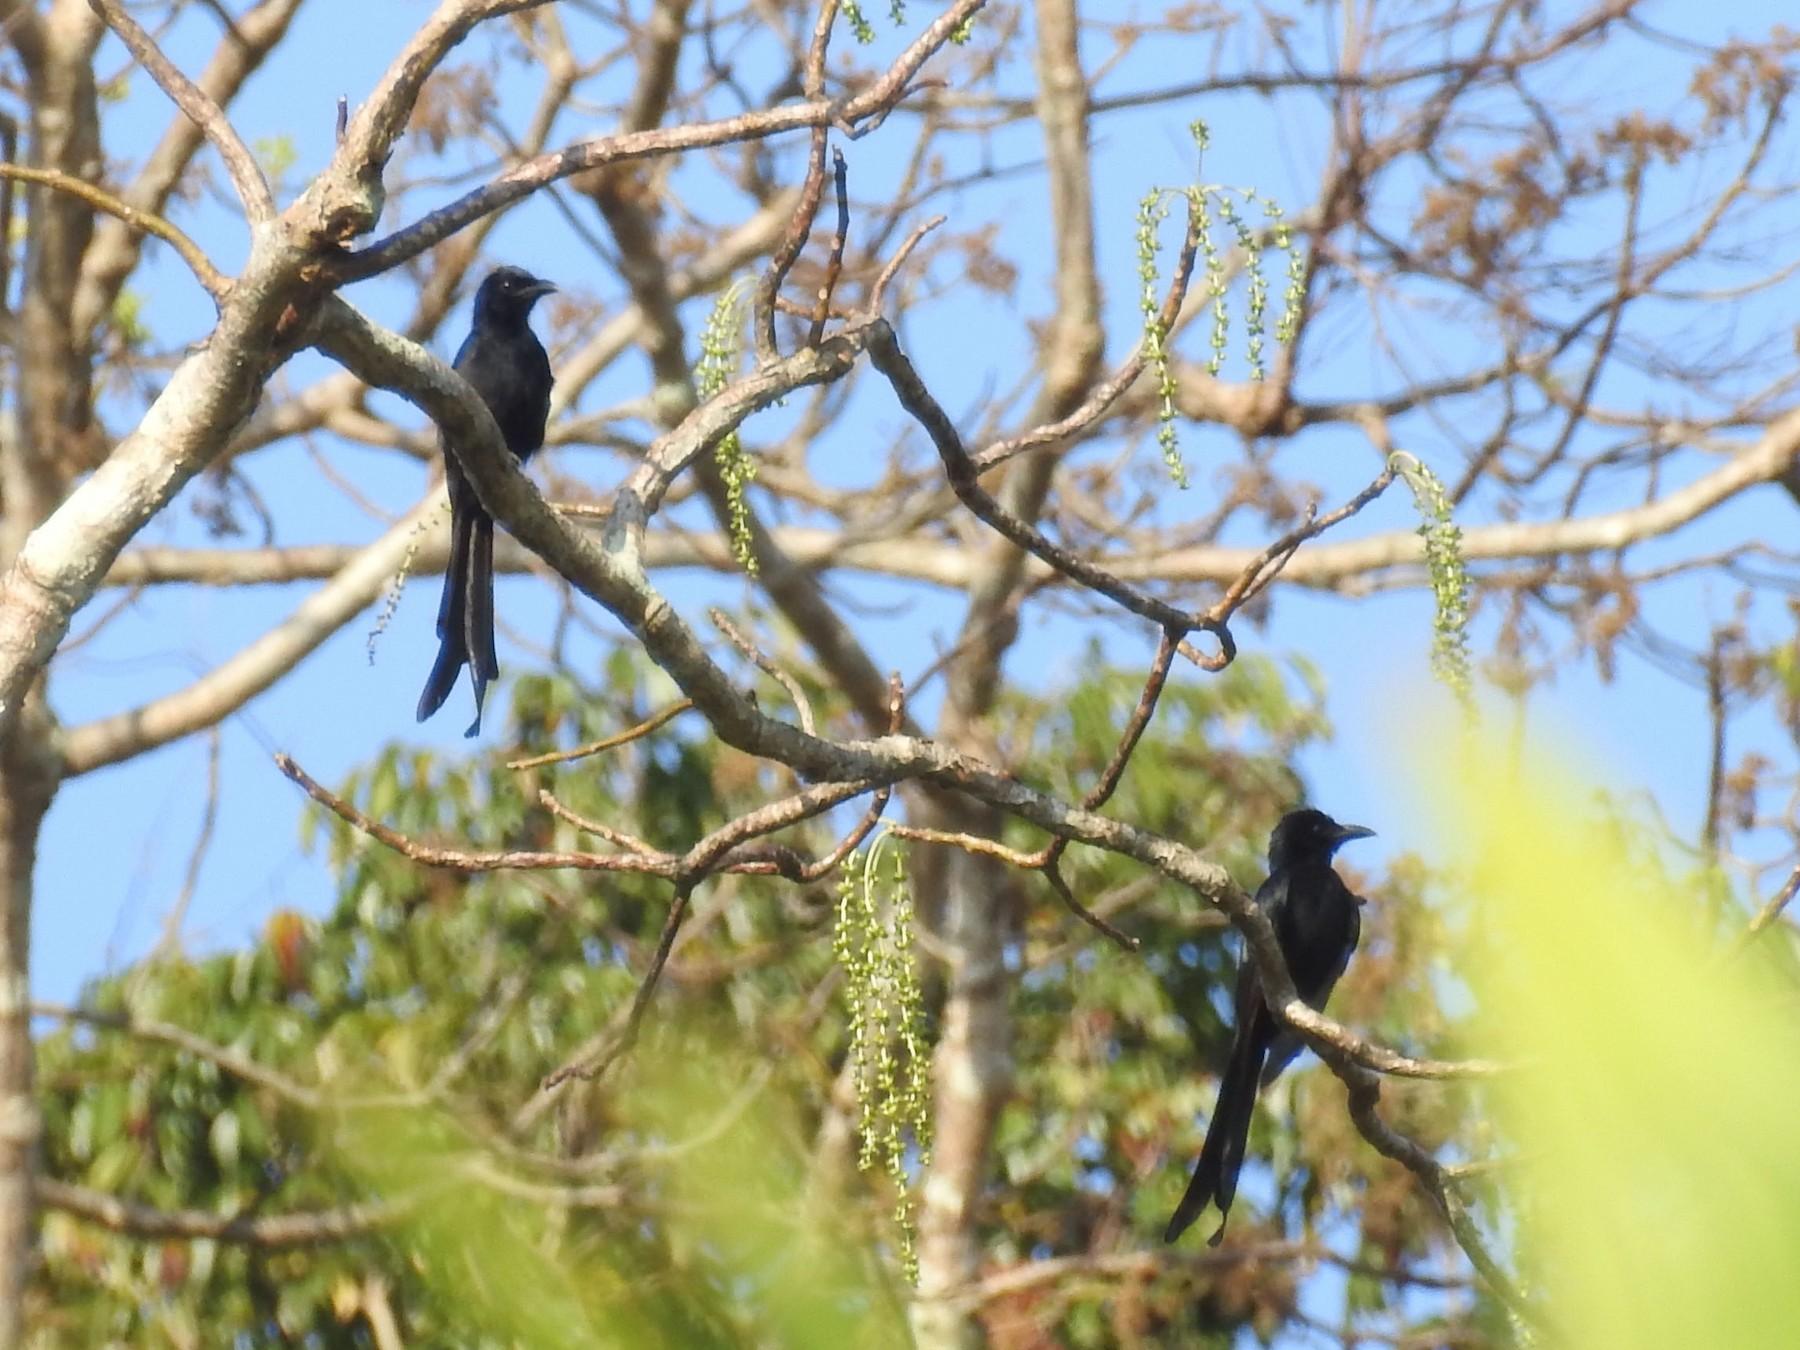 Andaman Drongo - Suhel Quader